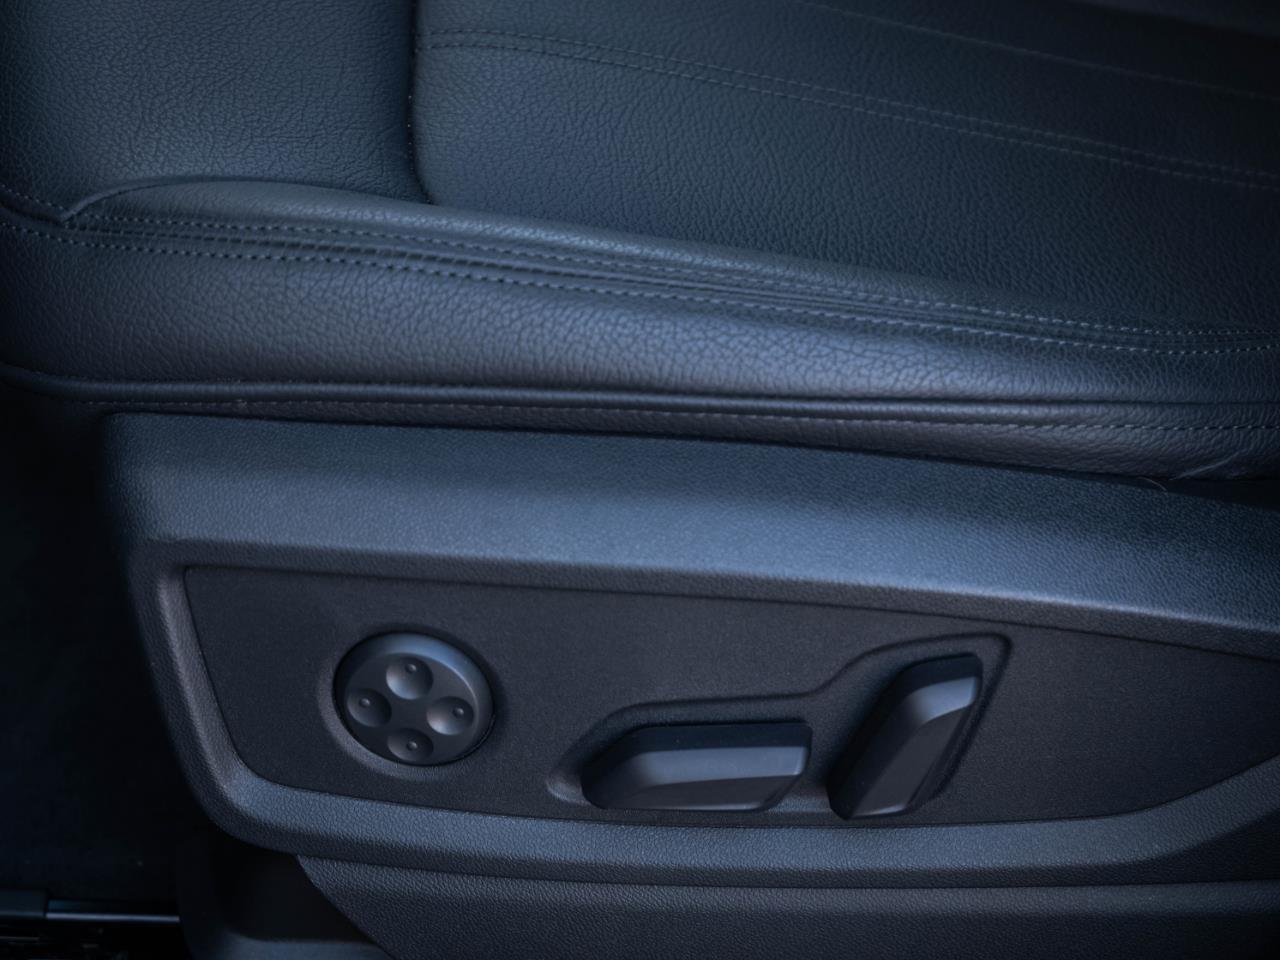 2020 Audi Q5 (CC-1317254) for sale in Marina Del Rey, California